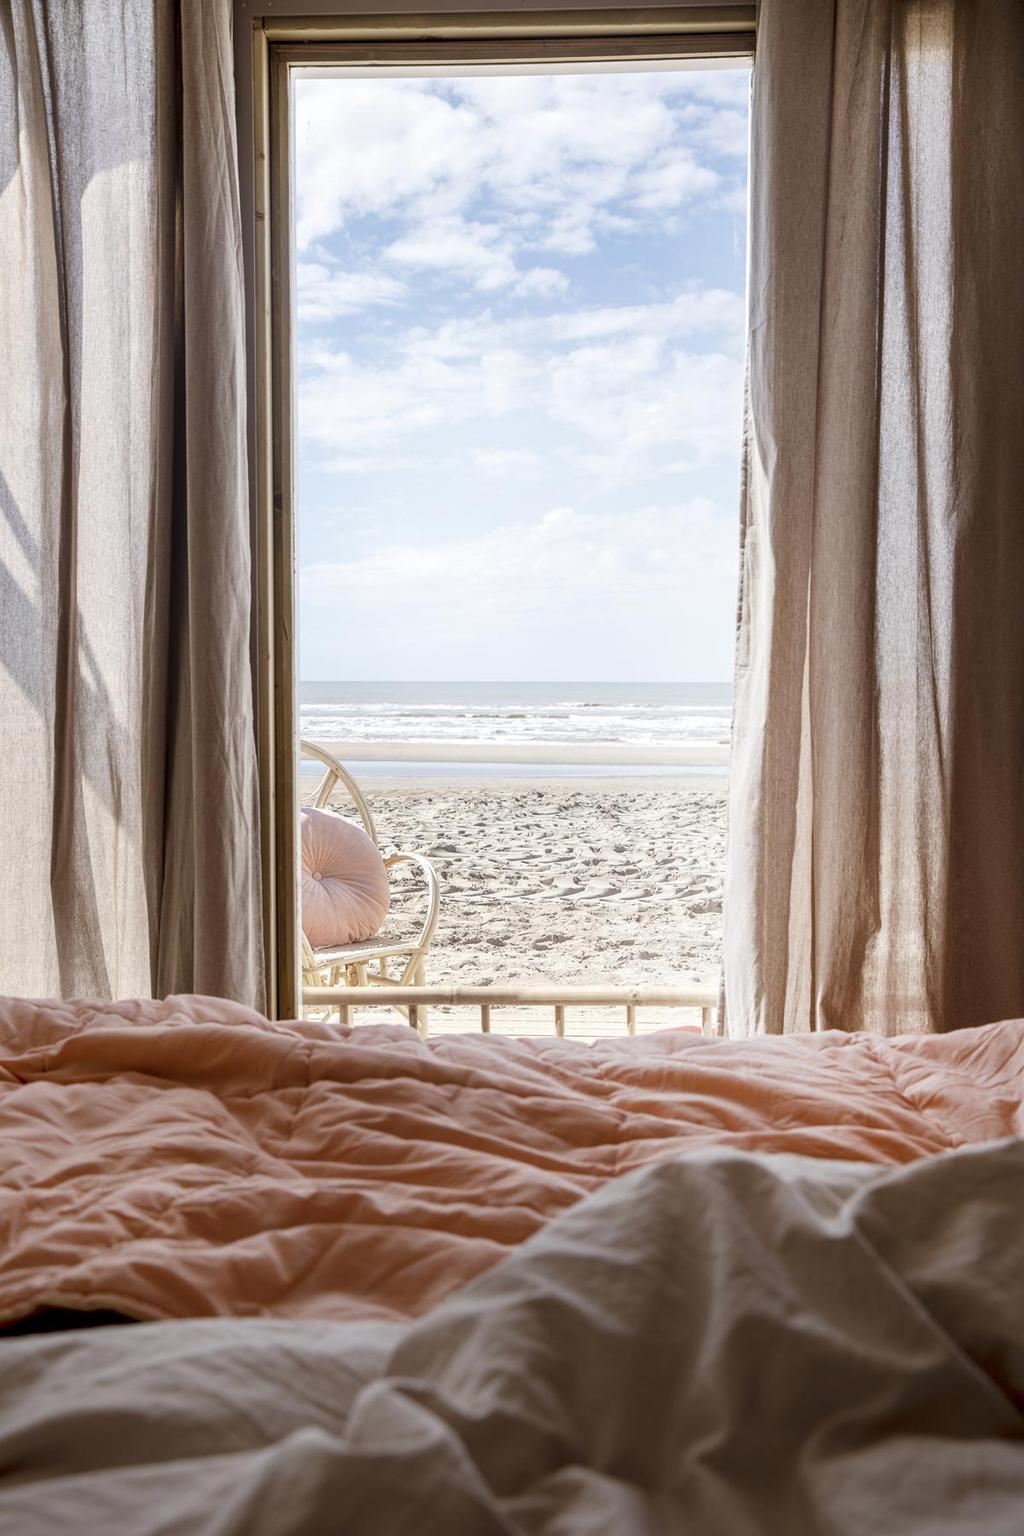 vtwonen strandkamers Zandvoort interieur